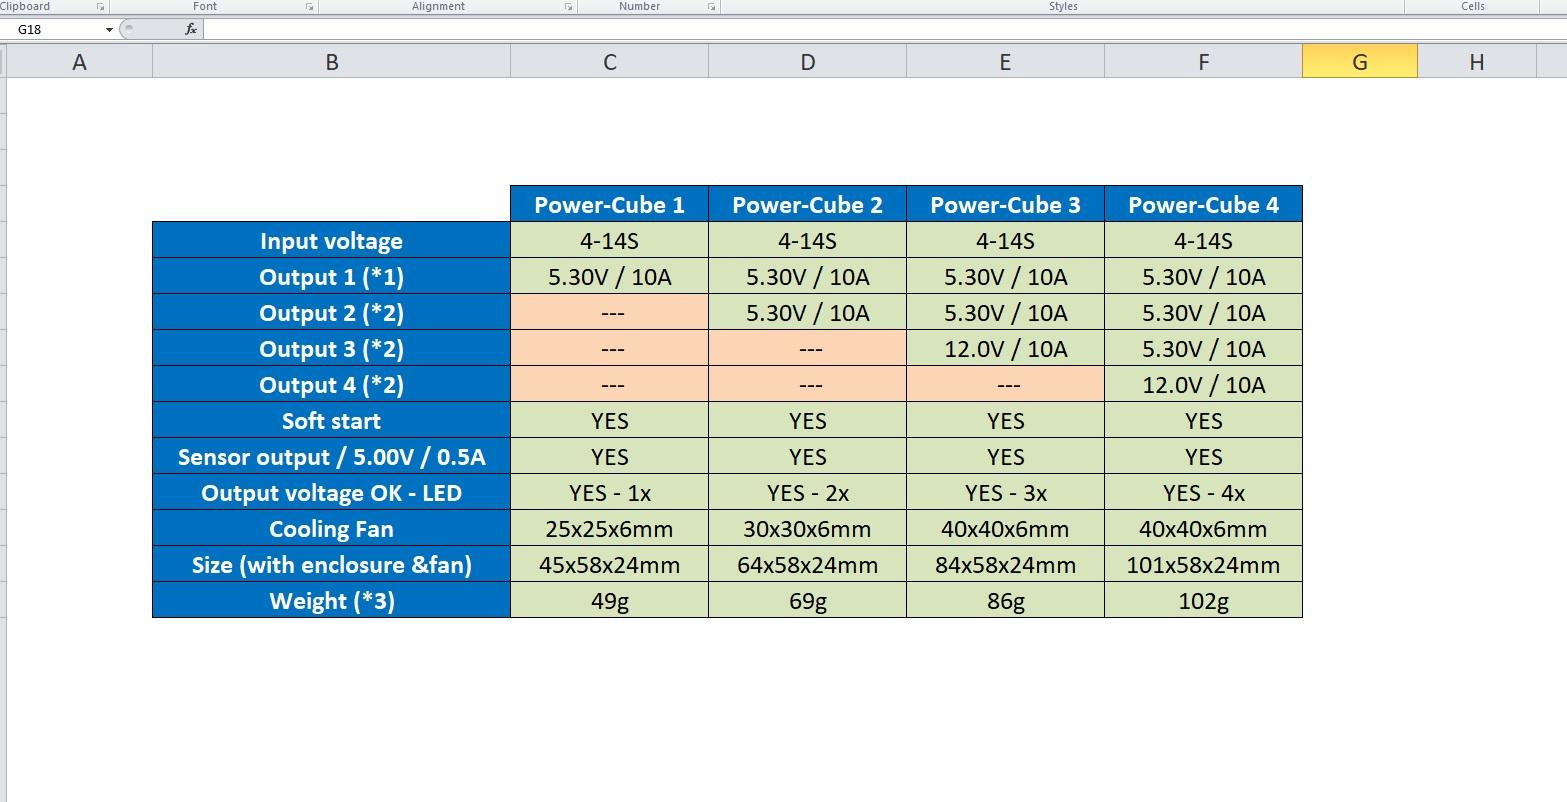 100A / 200A Hall Sensor PM for Pixhawk / APM - Power - Cube